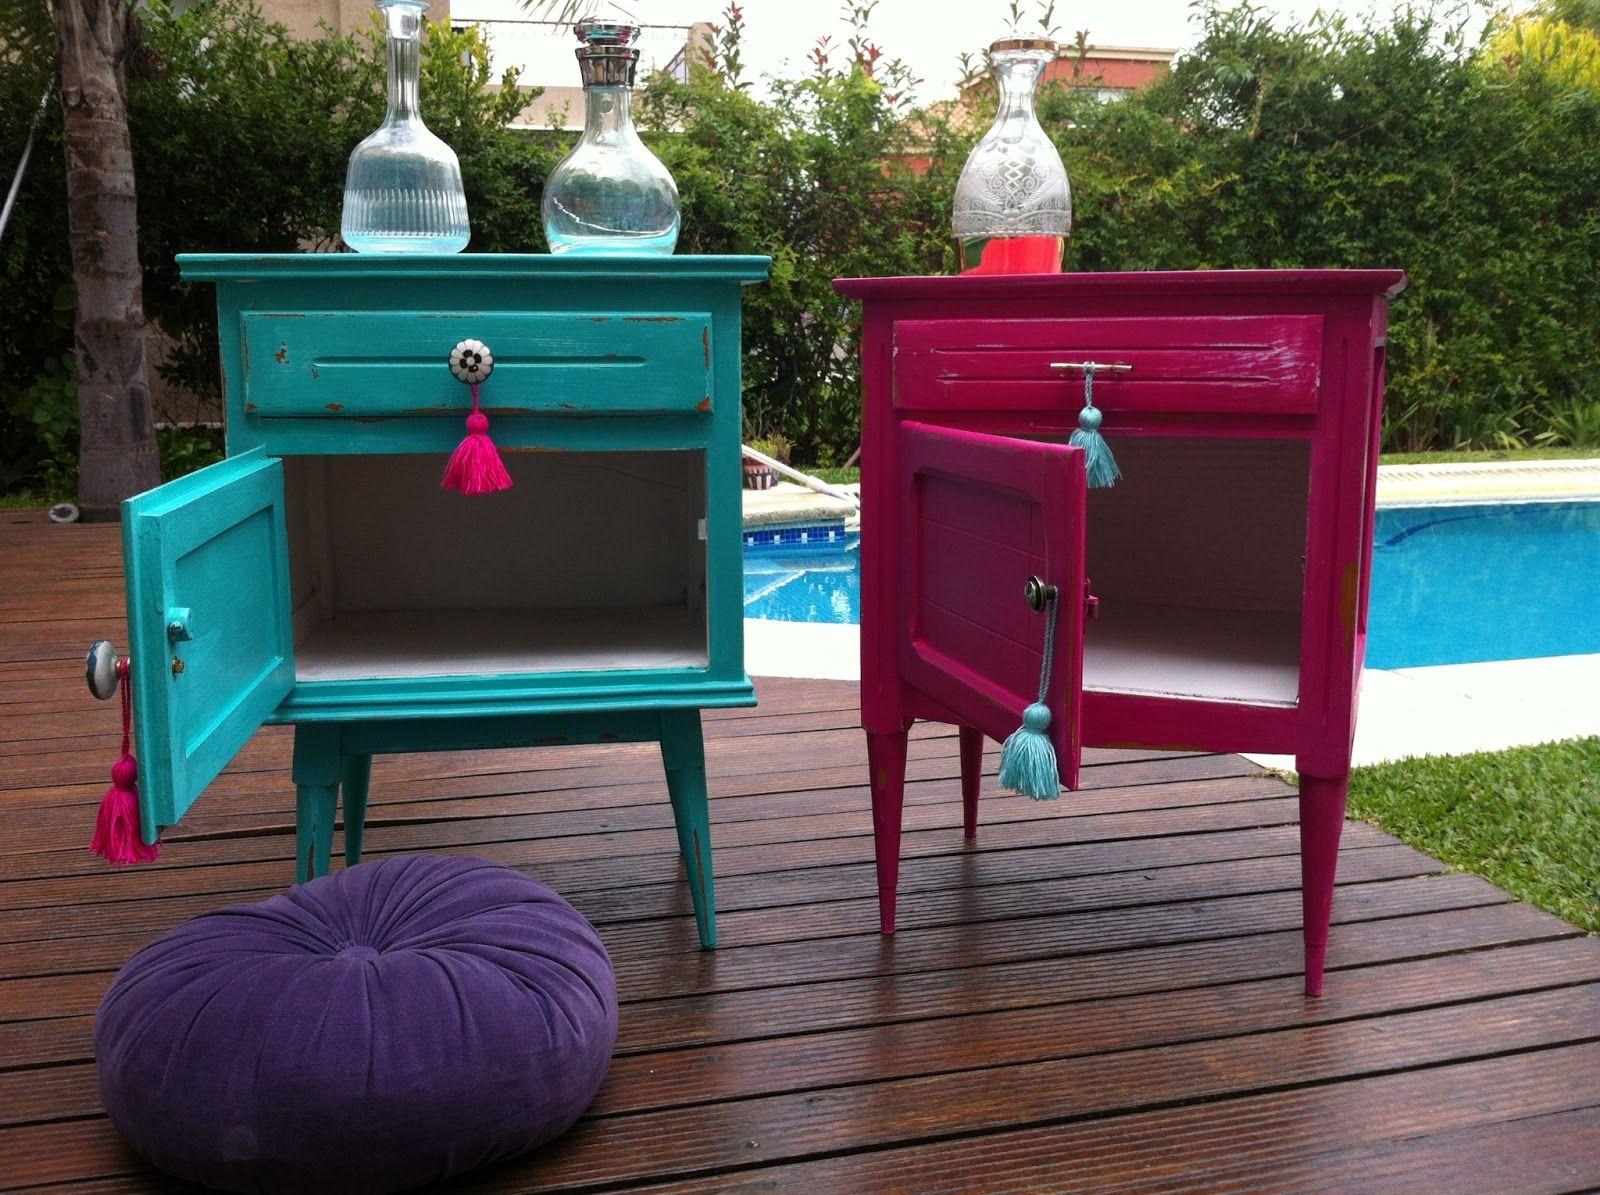 Mesitas de luz vintage home sweet home en 2018 - Sweet home muebles ...